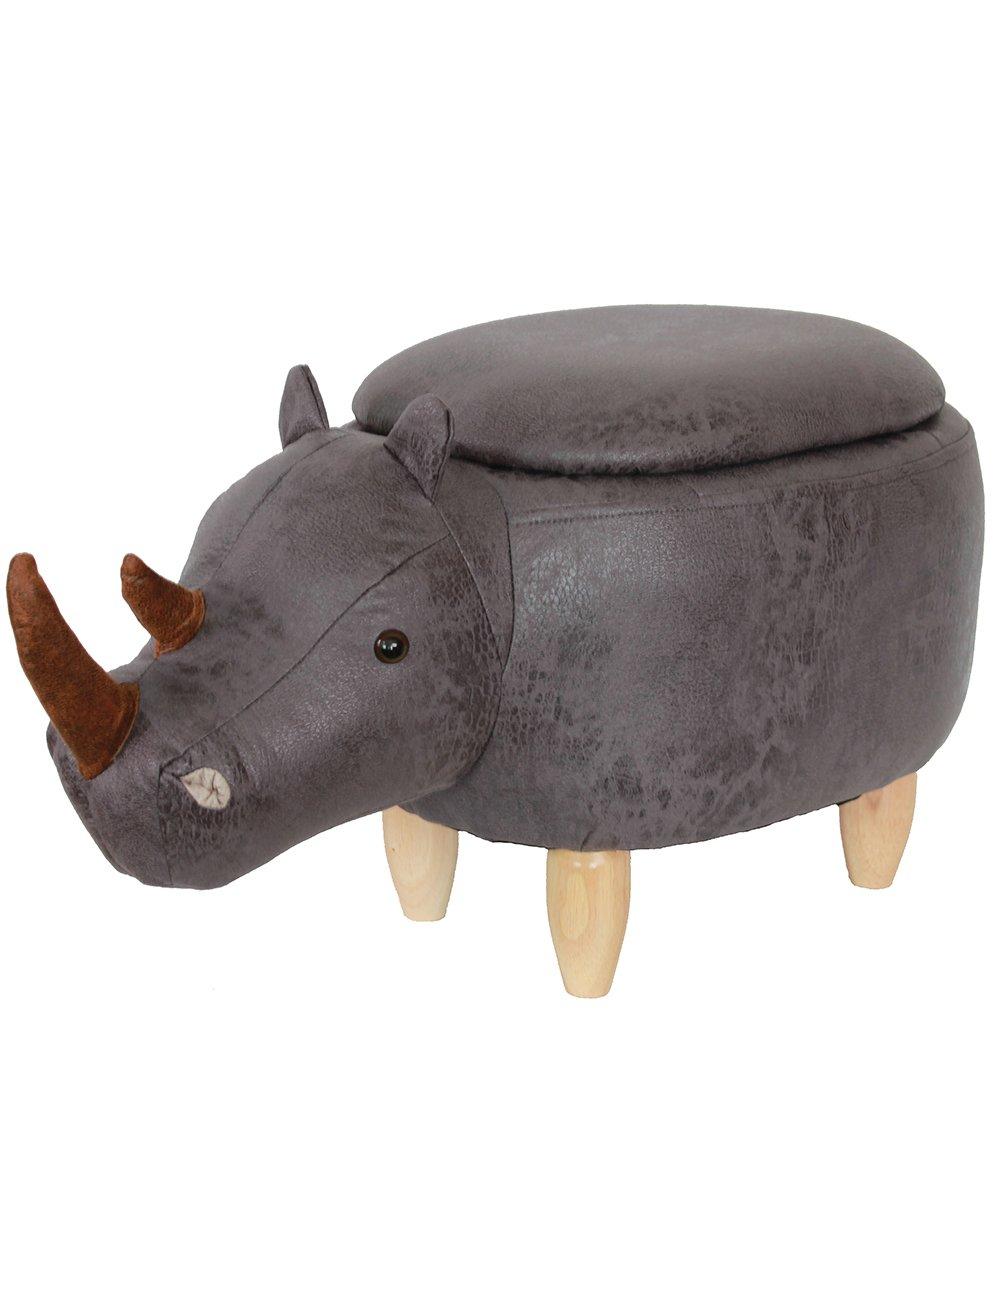 HAOSOON Animal ottoman Series Storage Ottoman Footrest Stool with Vivid Adorable Animal-Like Features(Rhinoceros) (grey)